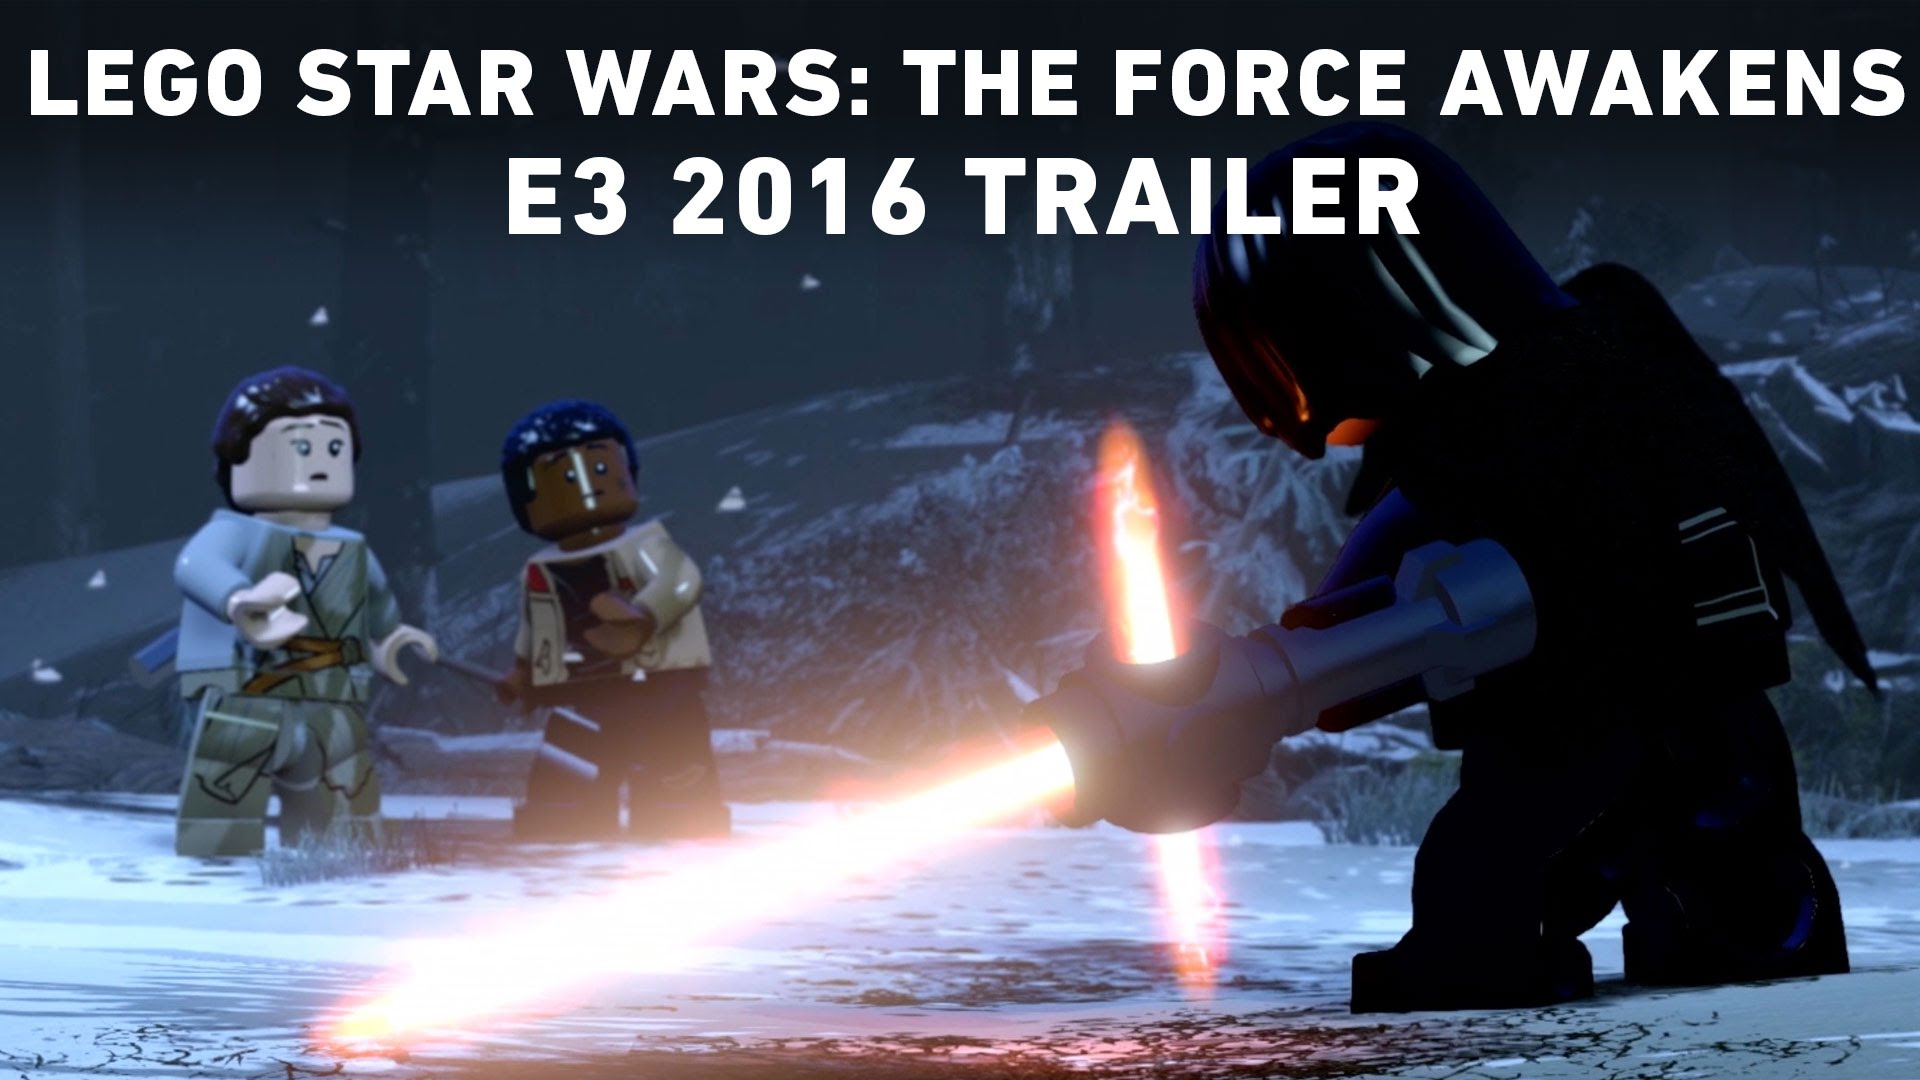 LEGO Star Wars: The Force Awakens E3 2016 Trailer